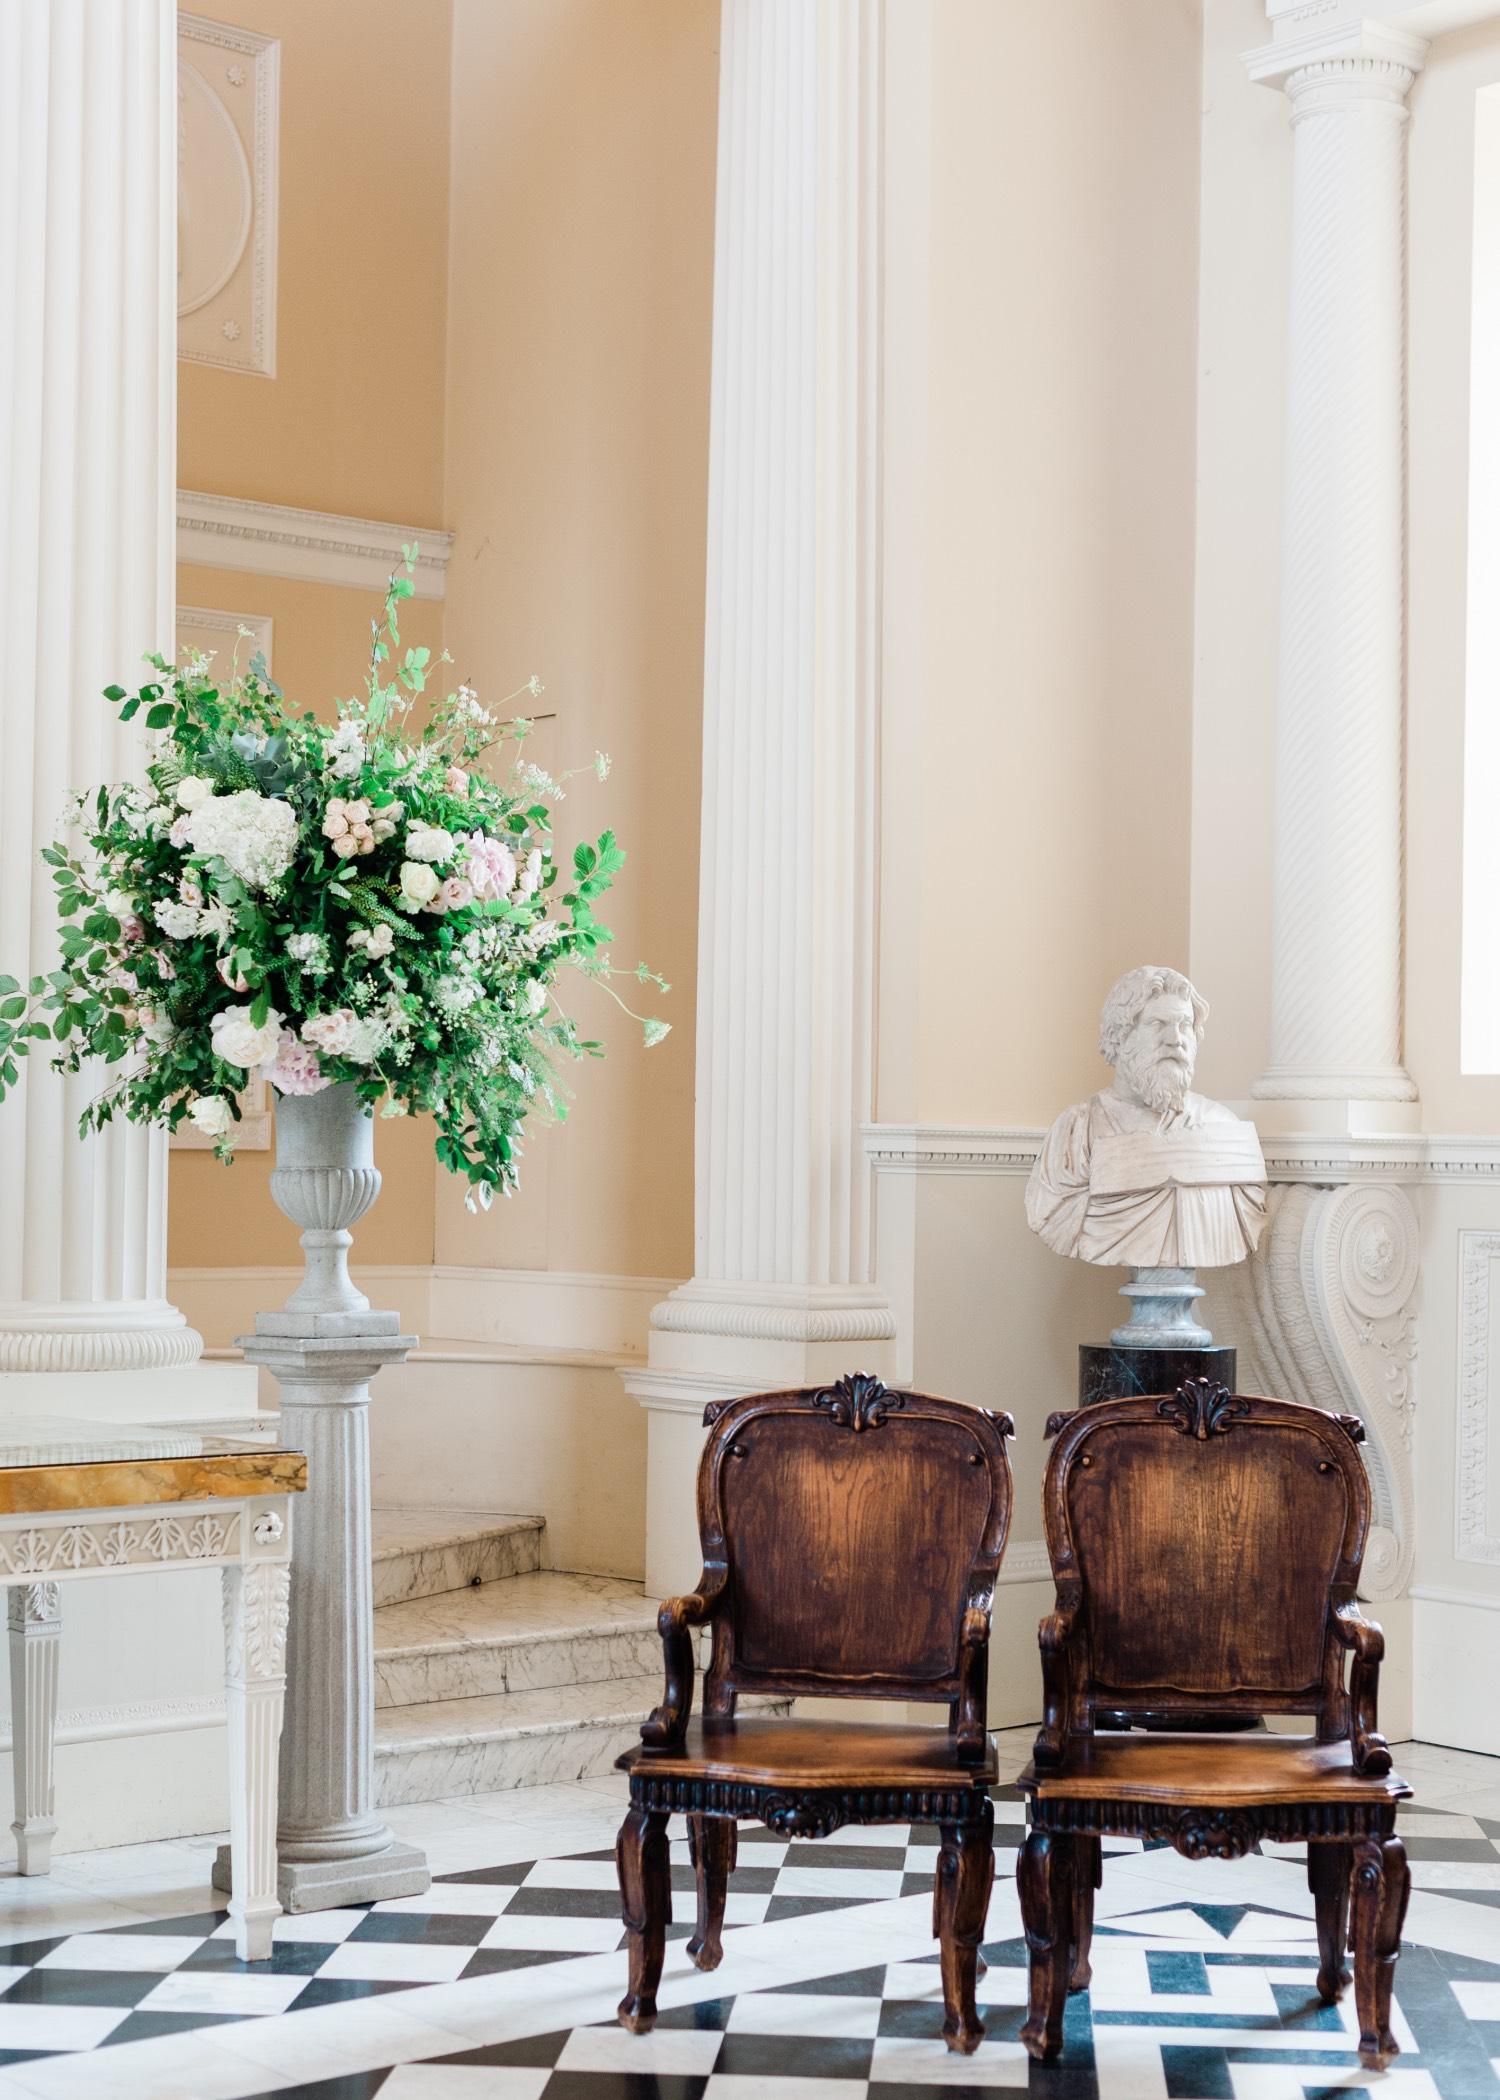 Littleton-Rose-Syon-House-London-Wedding-Planner-Ceremony.jpg